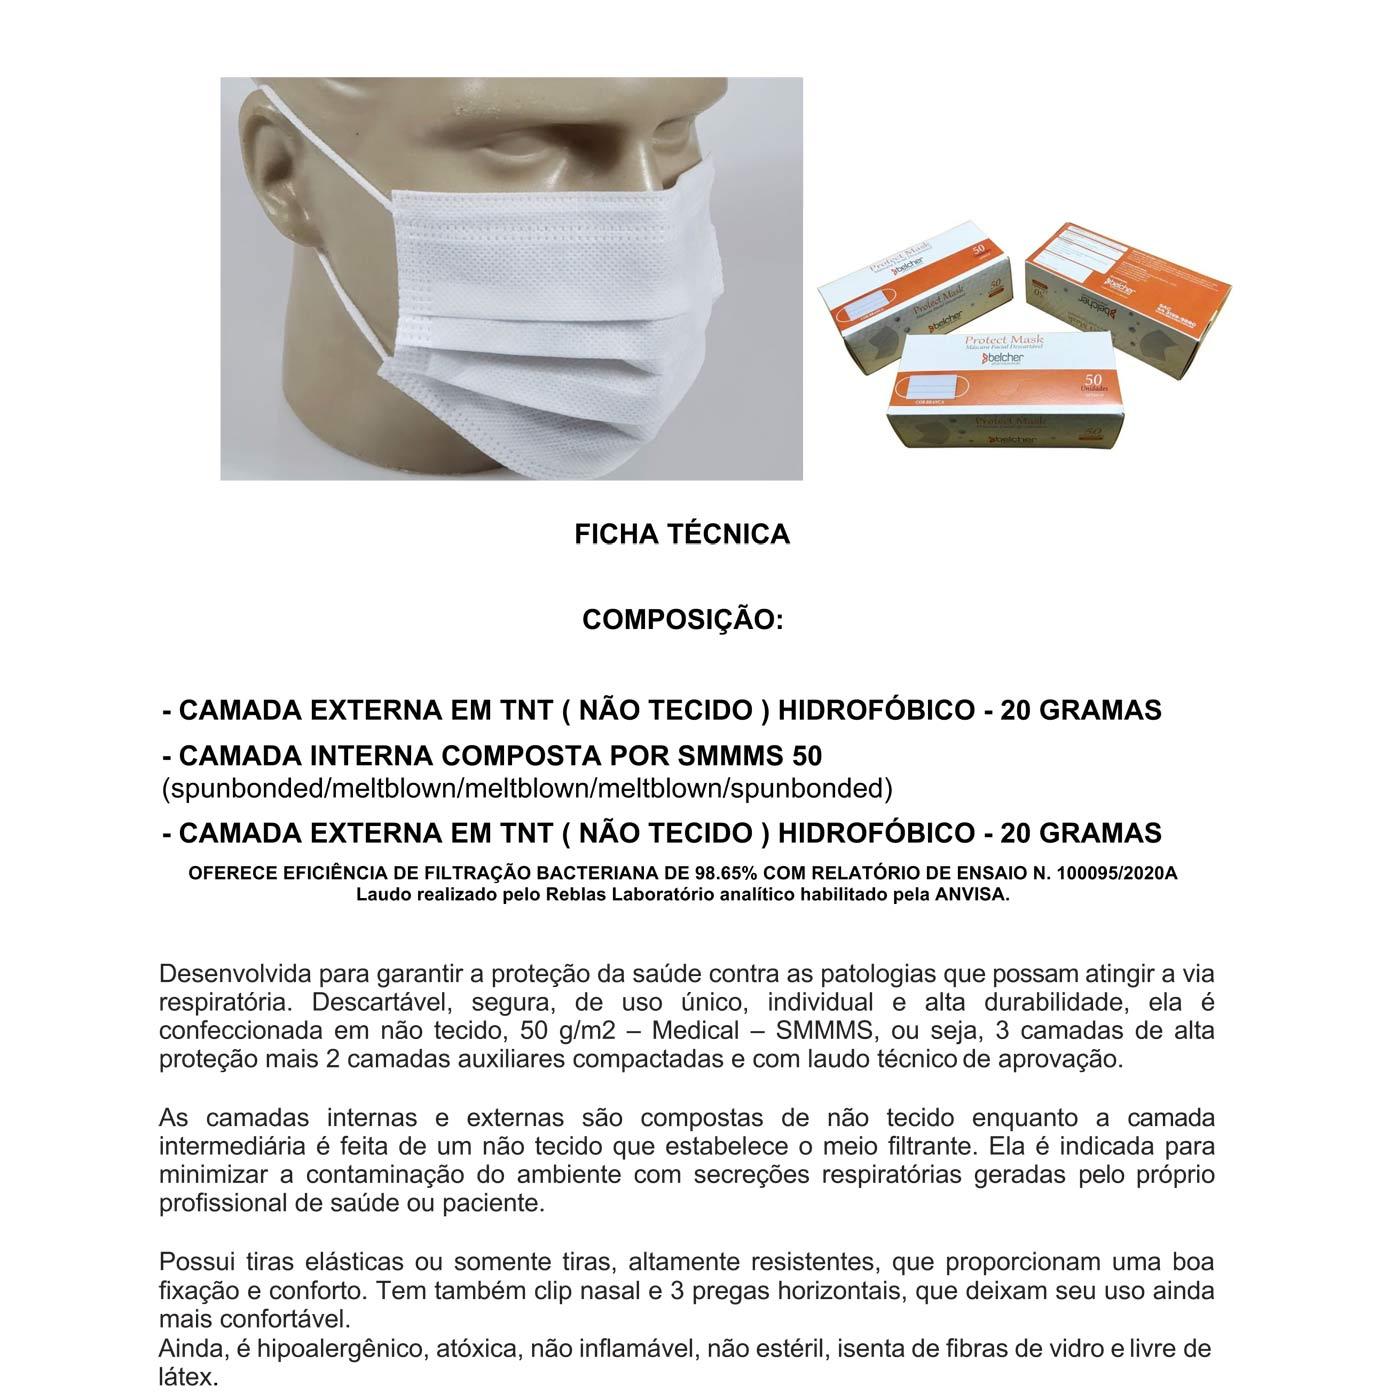 Proteção Cirúrgica   Descartável Cinco Camadas SMMMS-50 TNT   - Testes Para Drogas e COVID-19. Máscaras e Como Parar de Beber e Fumar